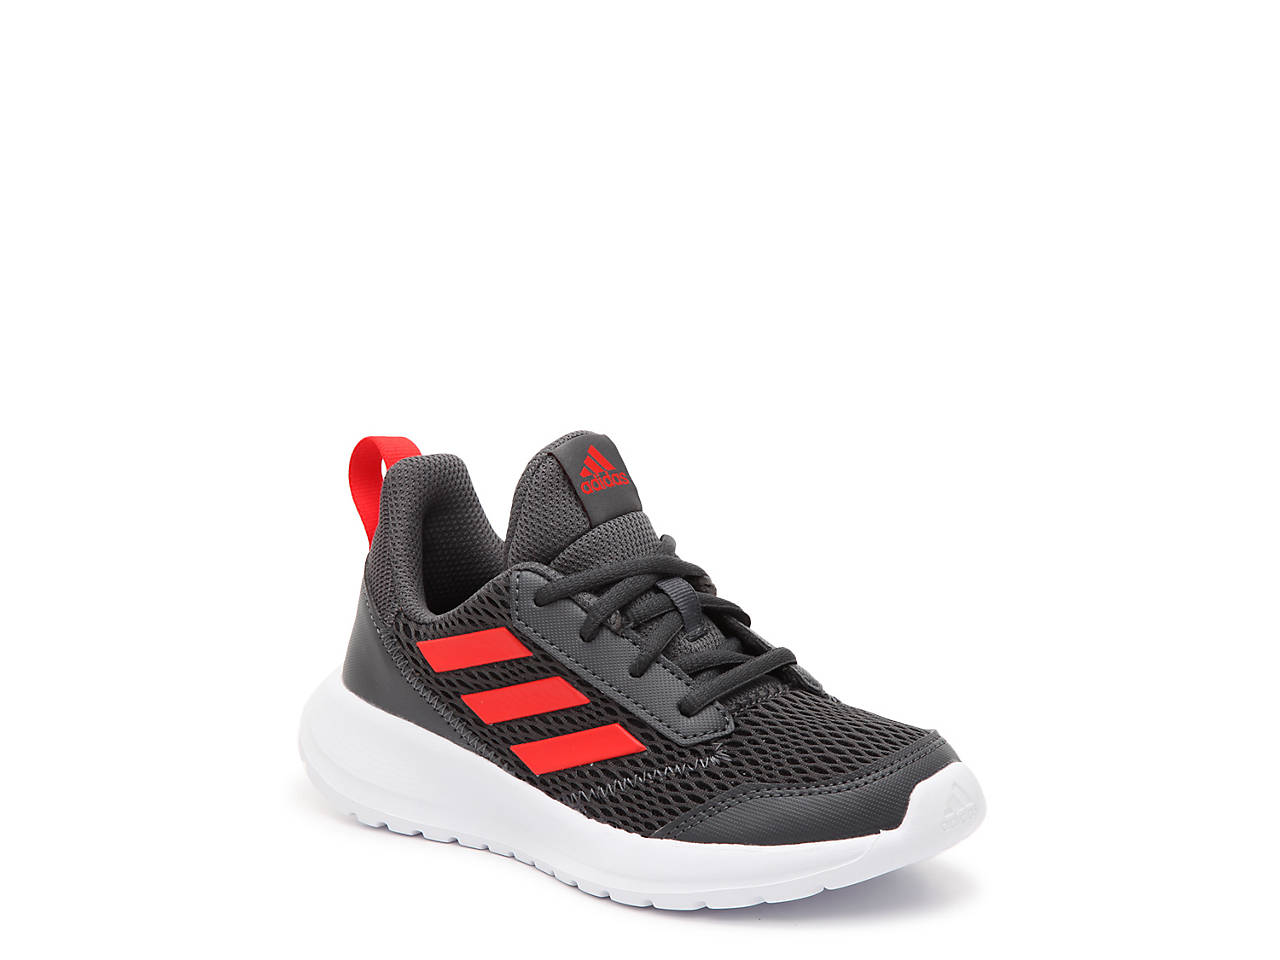 94d791faf adidas Altarun K Toddler   Youth Sneaker Kids Shoes